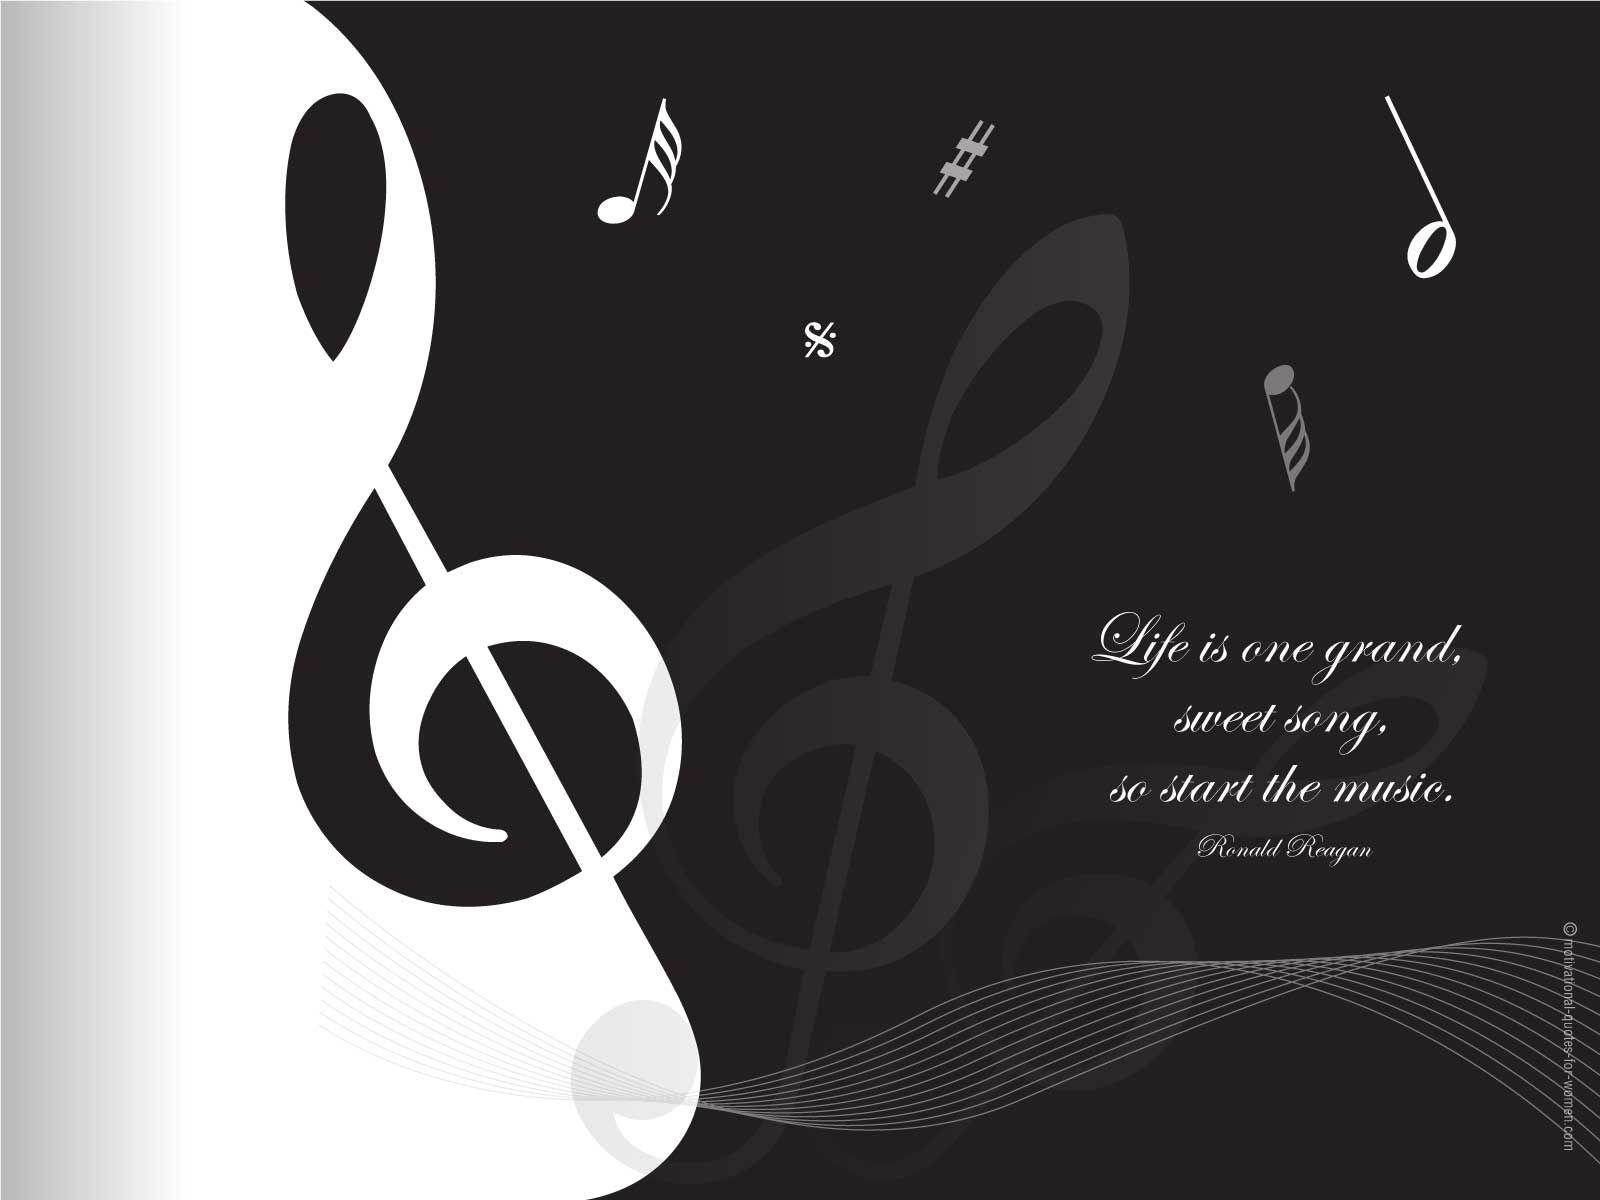 Top Wallpaper Music Motivation - bdee92aefbd16090a1464281e1faadba  Snapshot_77641.jpg